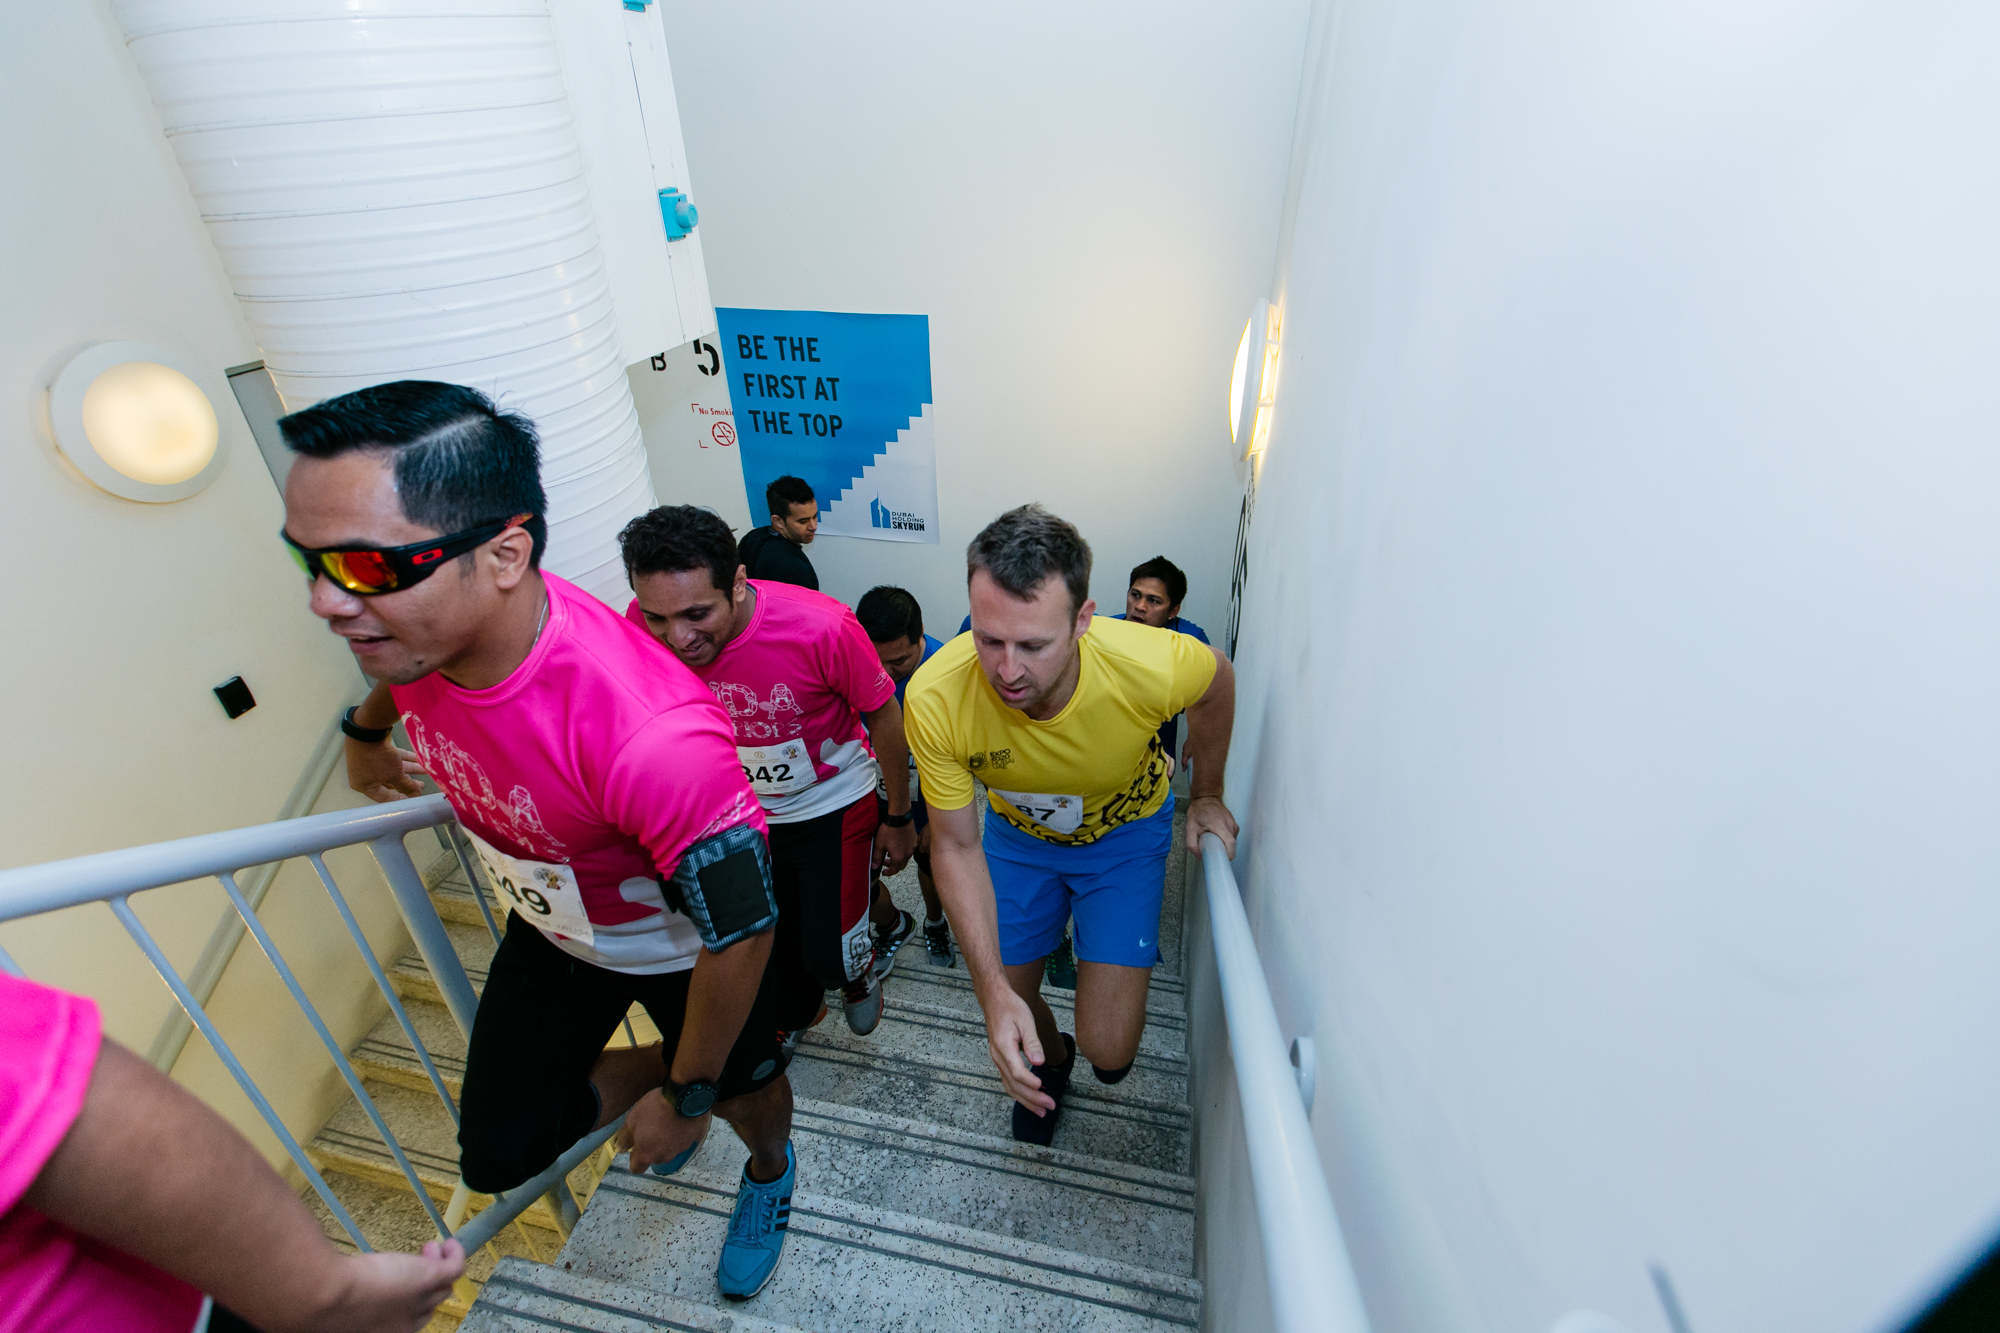 The runners in action. ©Dubai Holding SkyRun